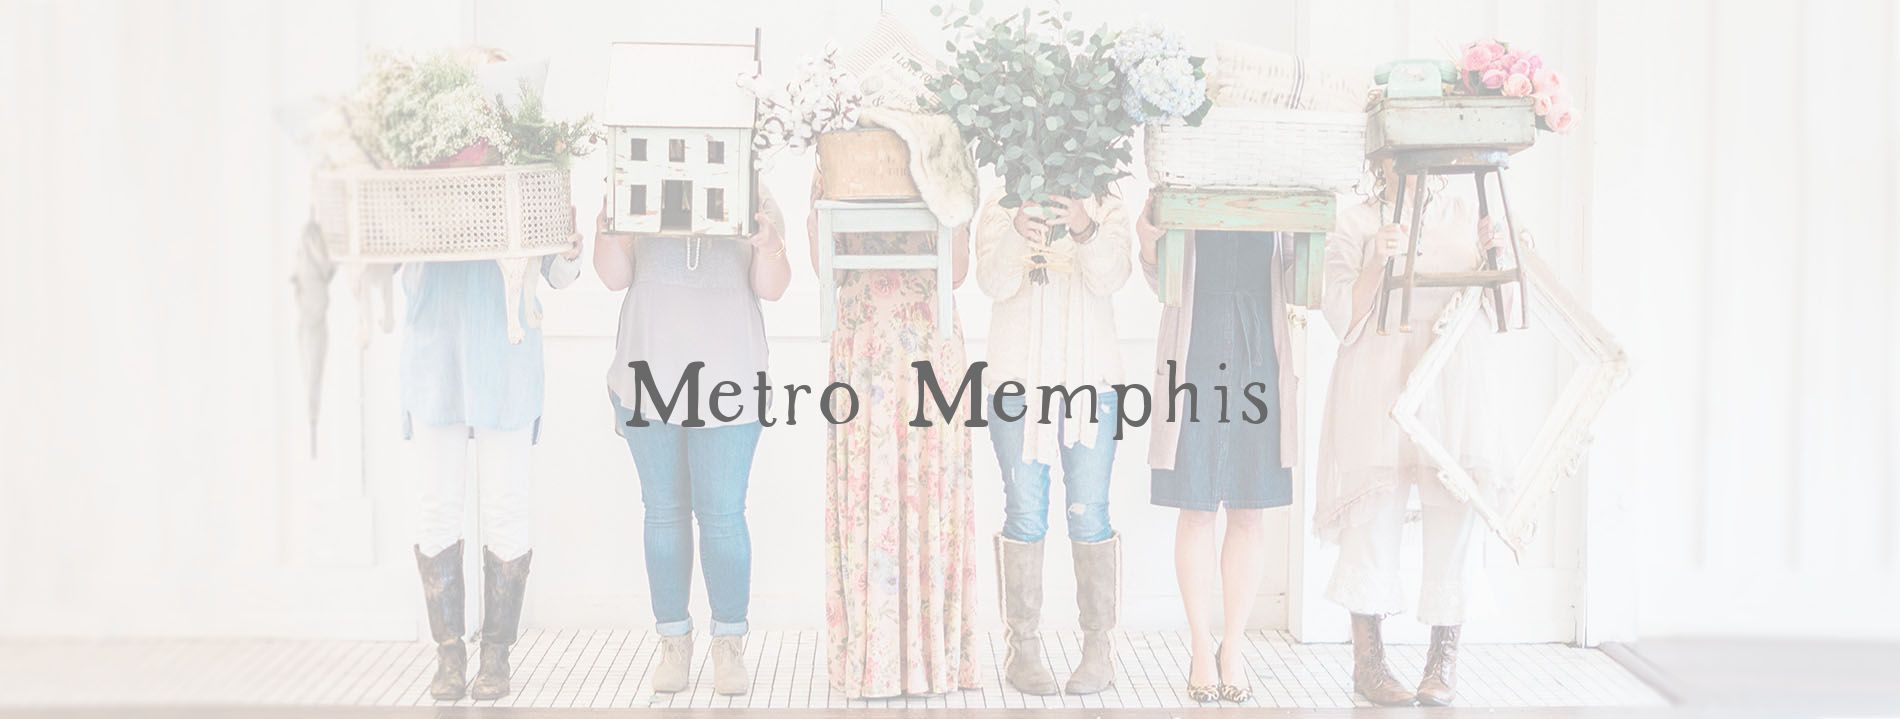 Metro Memphis